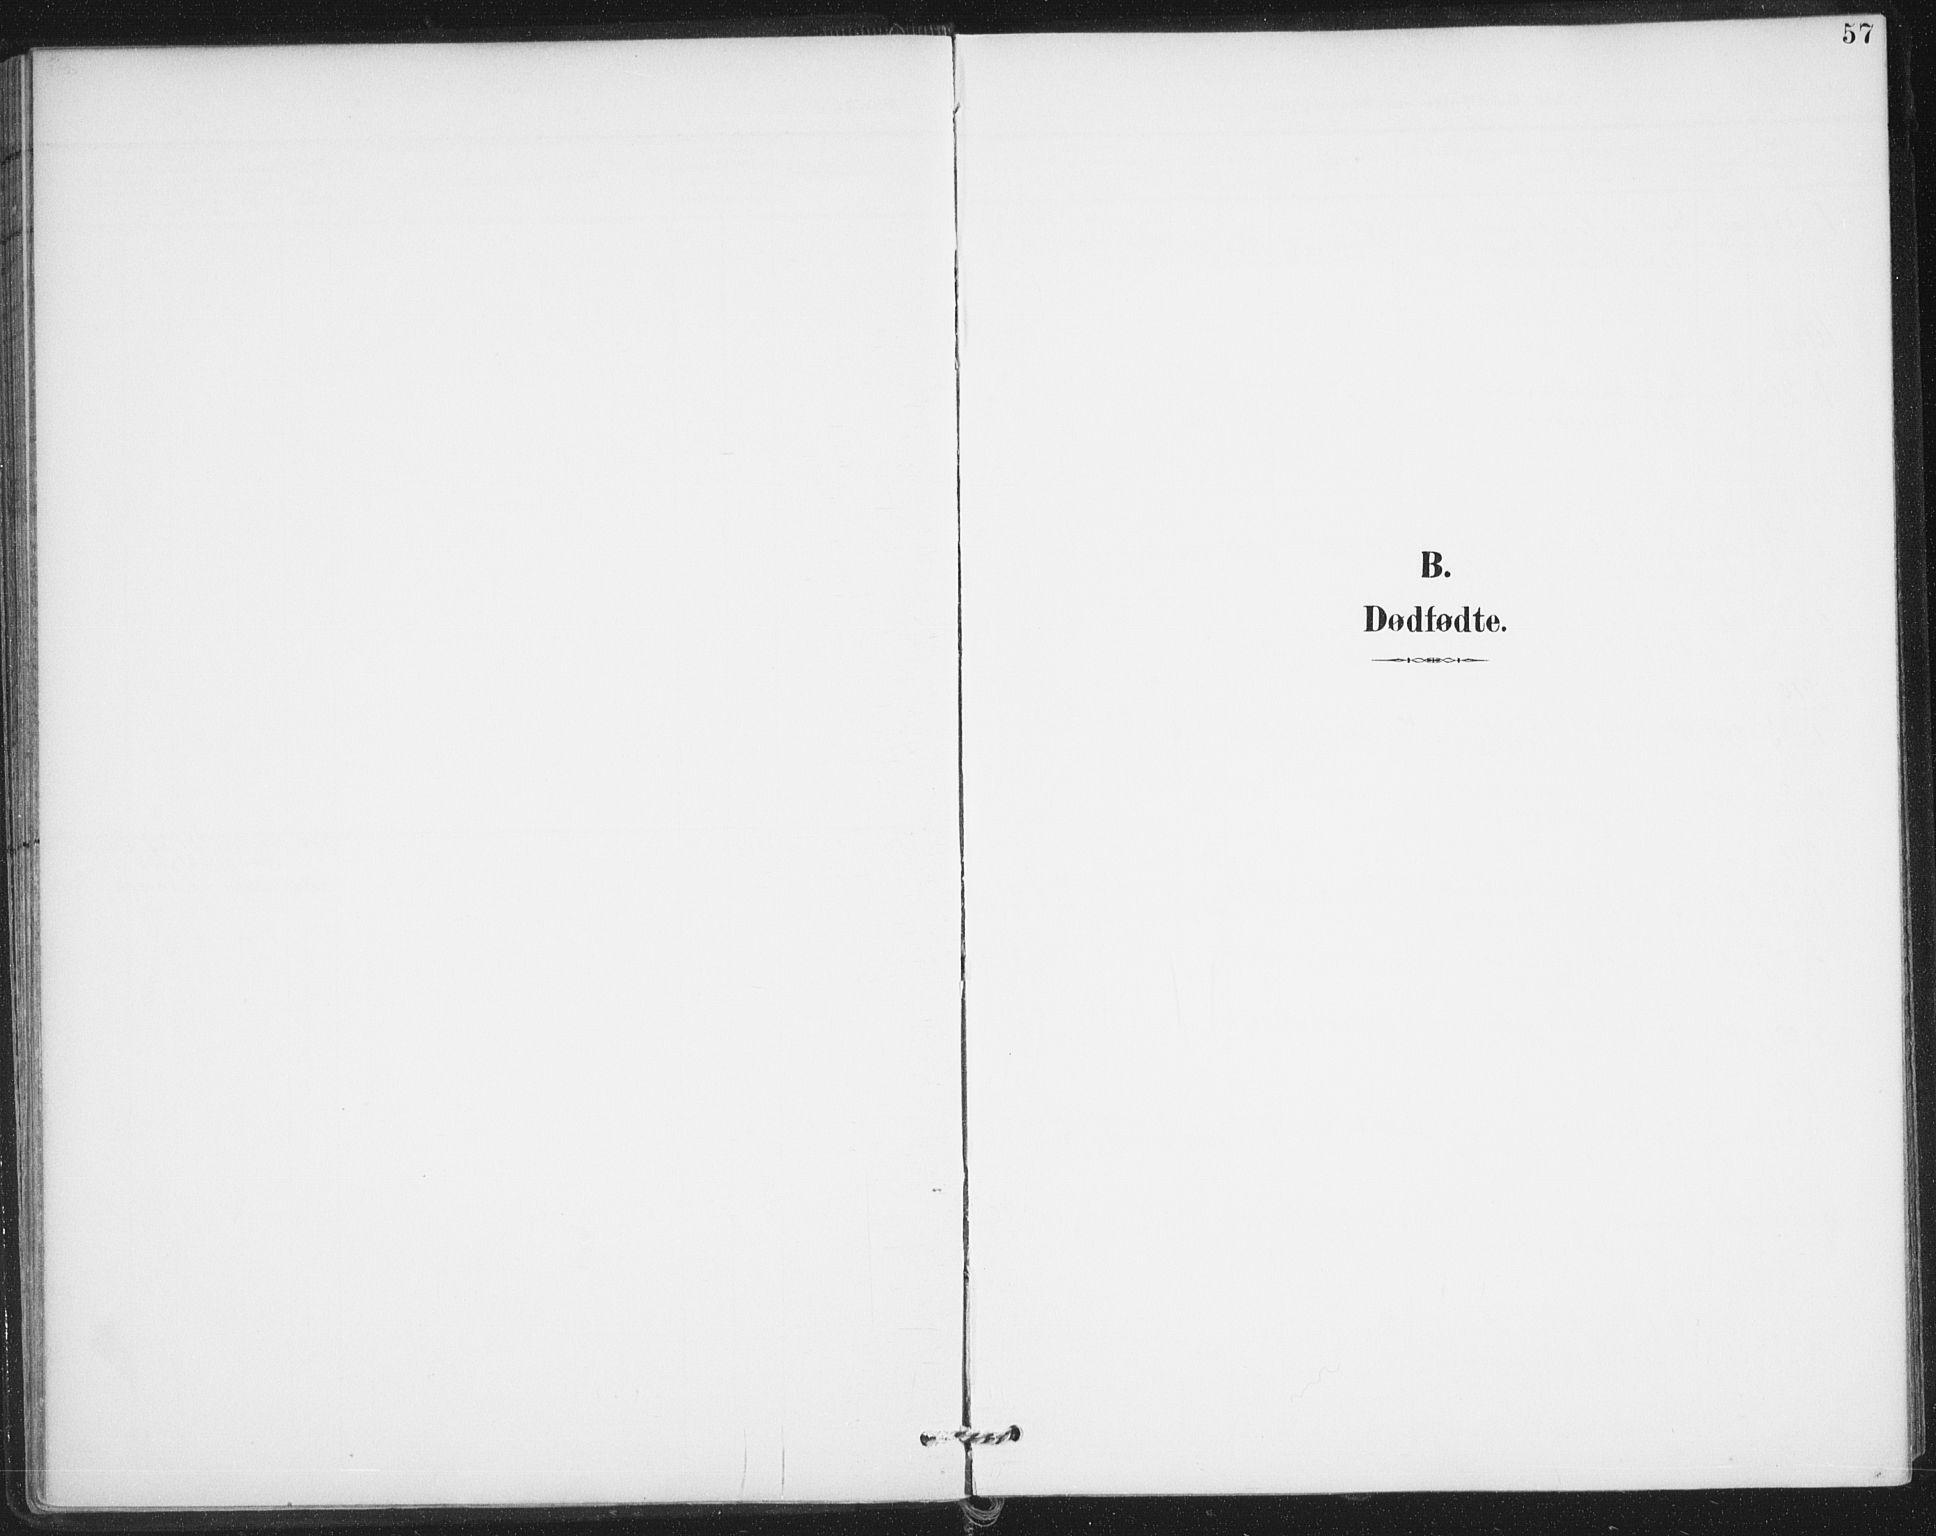 SAO, Varteig prestekontor Kirkebøker, F/Fa/L0003: Ministerialbok nr. 3, 1899-1919, s. 57